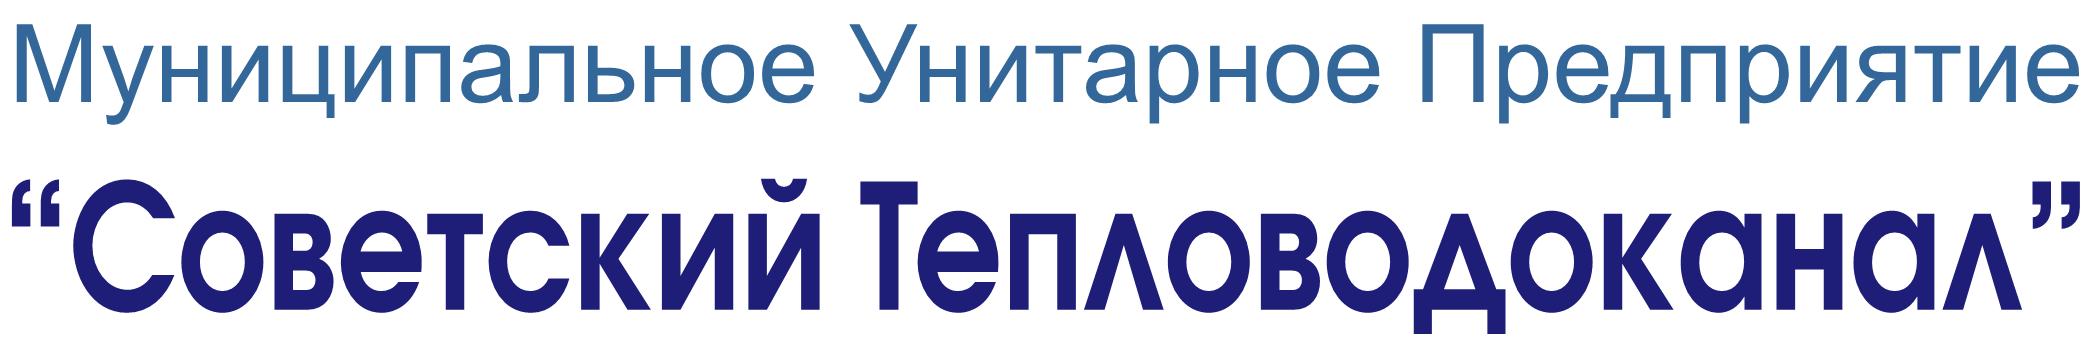 МУП Советский Тепловодоканал - МУП СТВК Советский район ХМАО